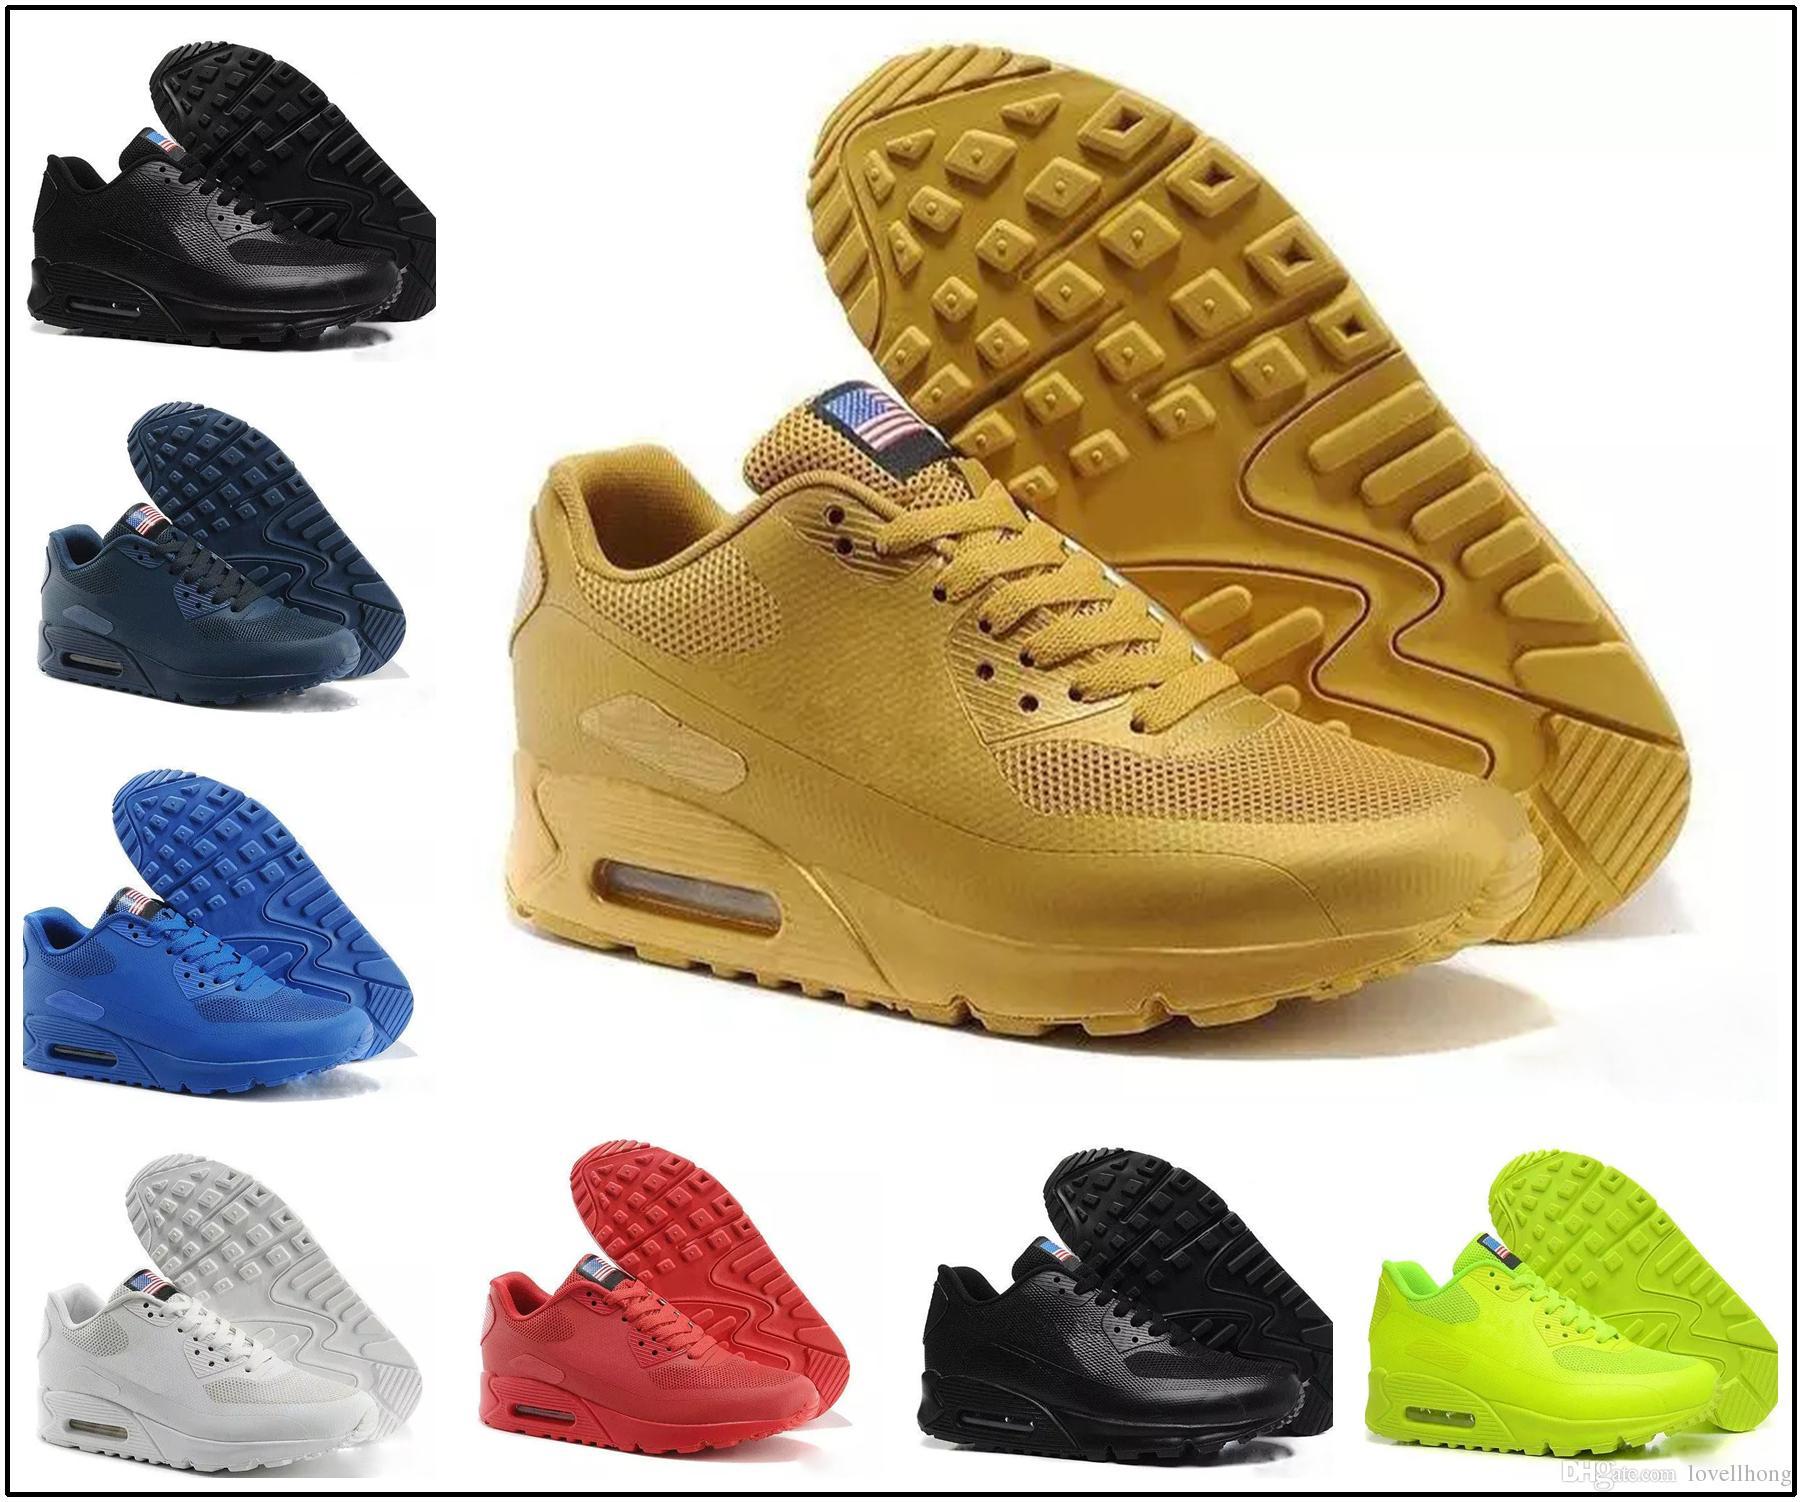 pick up cd178 8c7b4 Compre Nike Air Max 90 HYP PRM QS Zapatillas Deportivas Alr 90 HYP PRM QS  Hombre Mujer Alr 90s Bandera Americana Negro Blanco Azul Marino Oro Plata X  A M ...